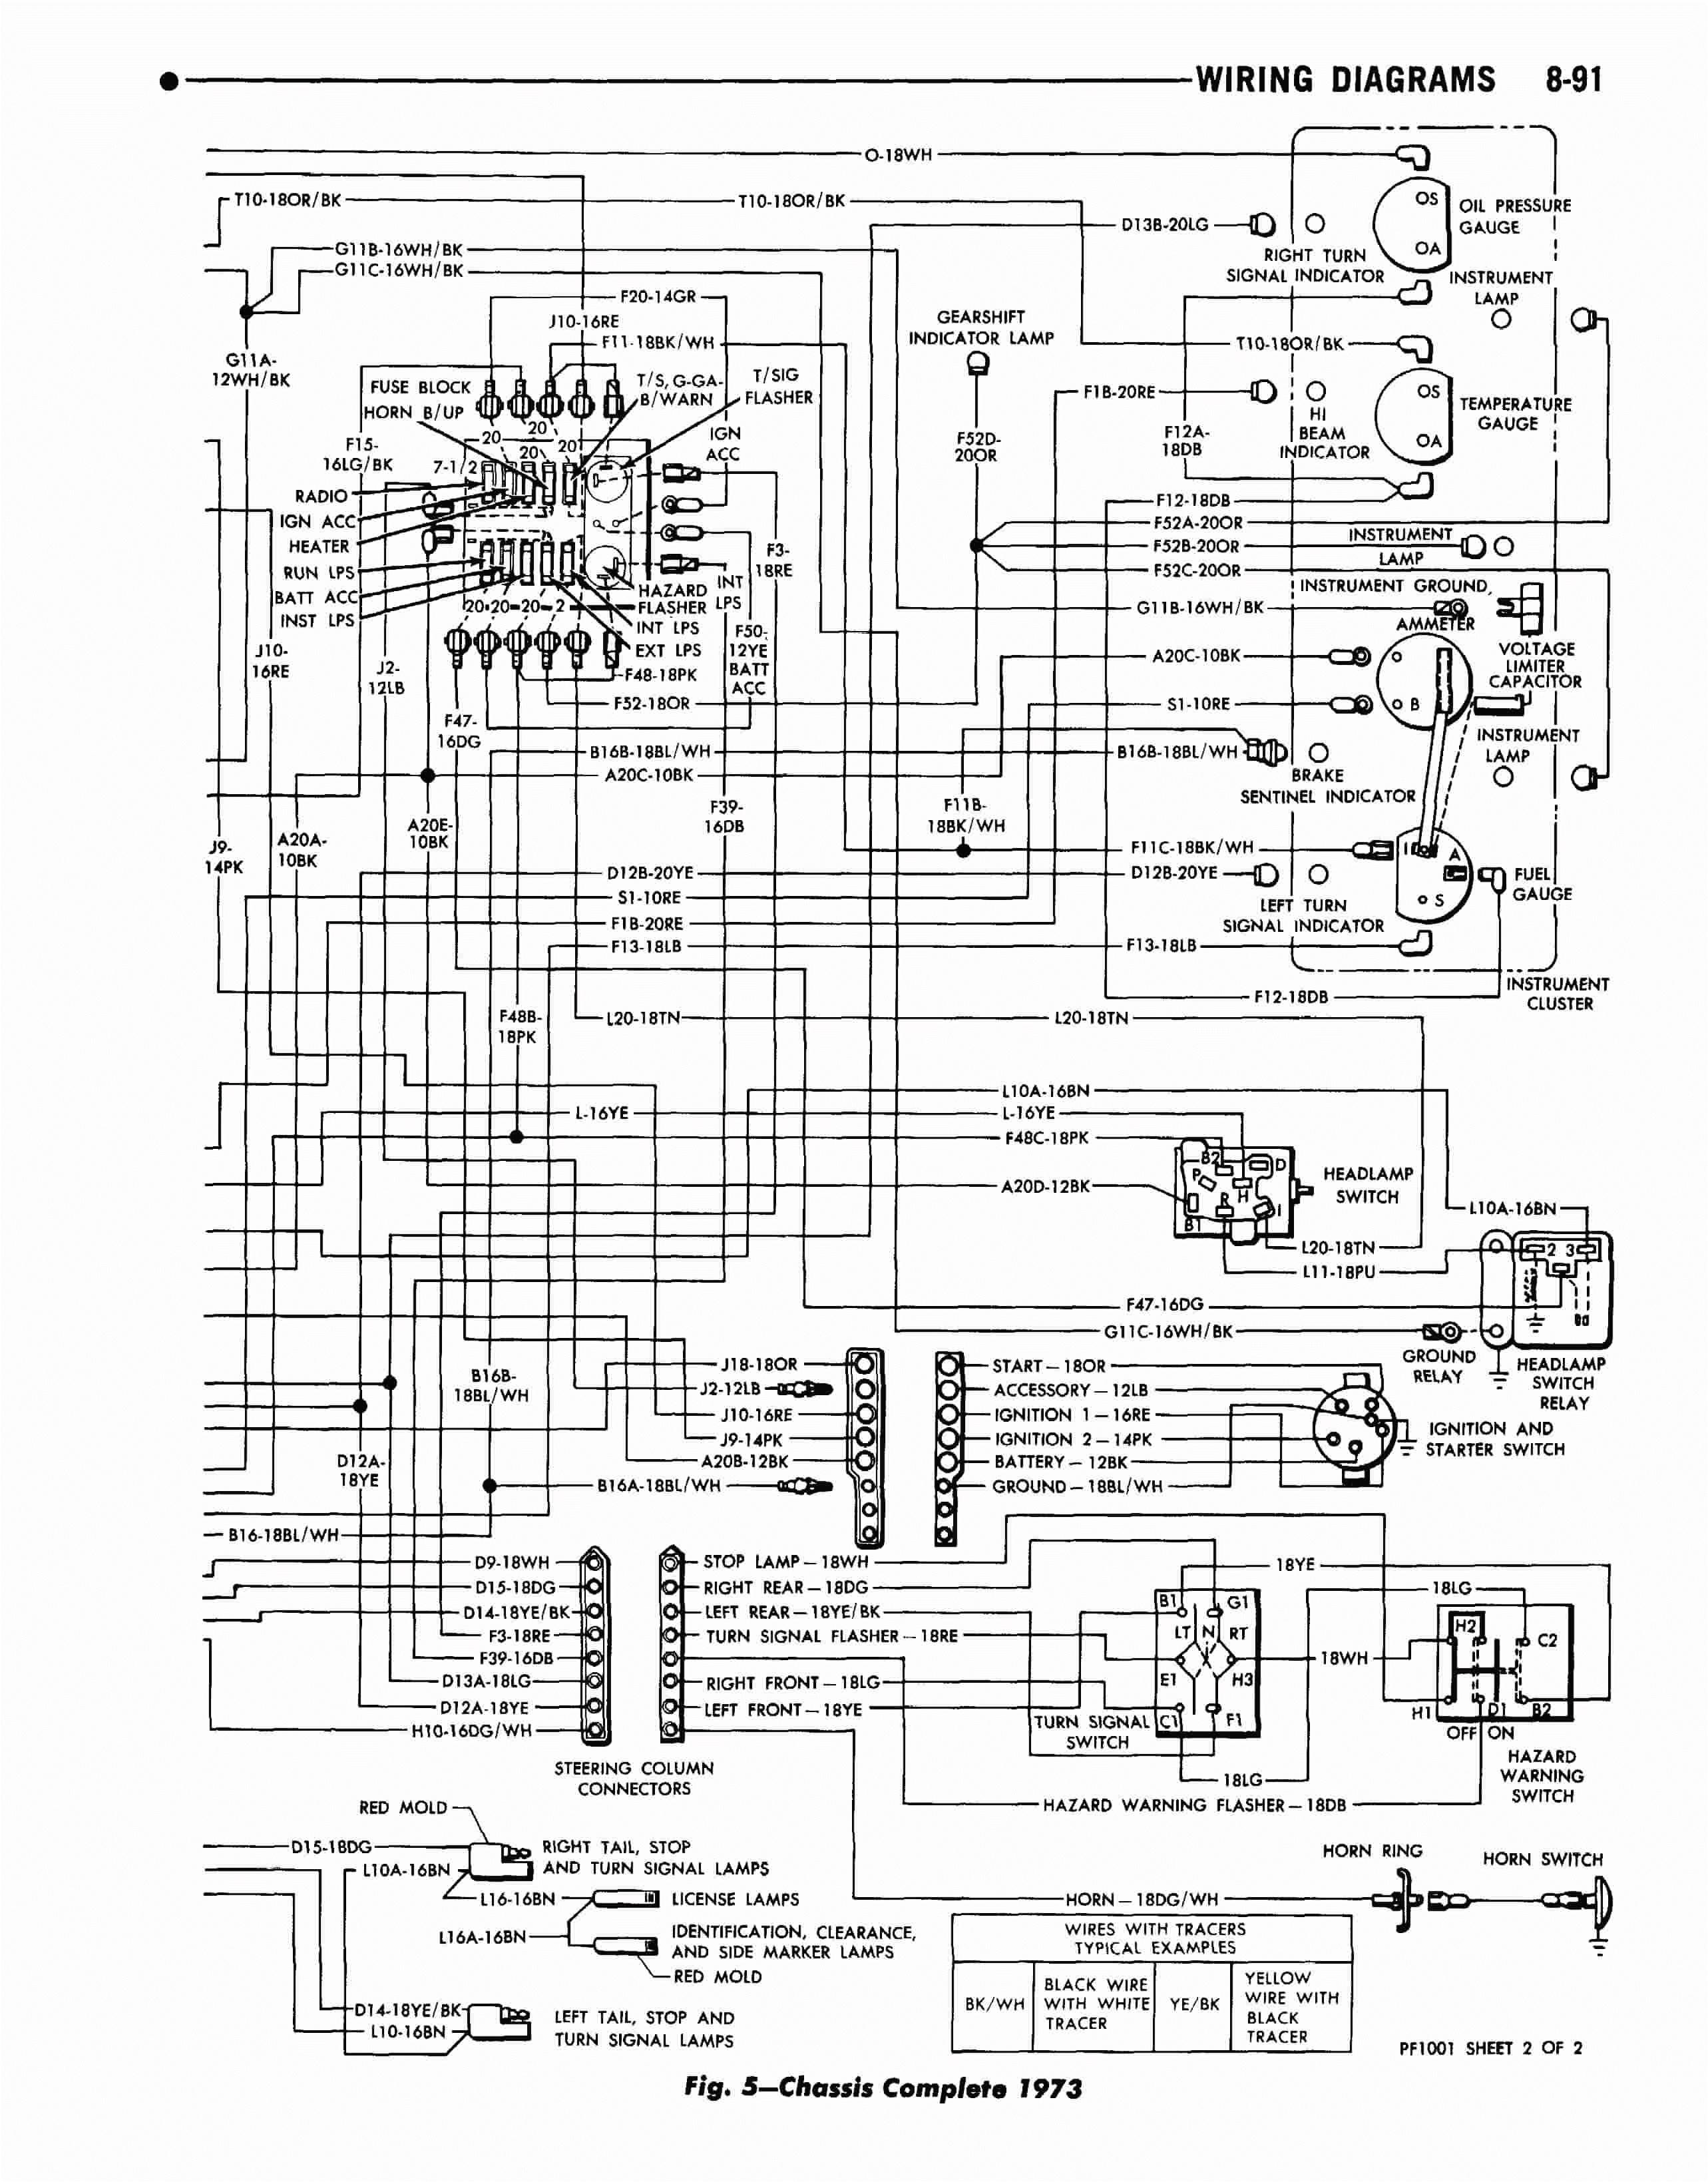 wiring diagram 1987 ford rv camper auto wiring diagram databaseitasca wiring diagrams blog wiring diagram wiring